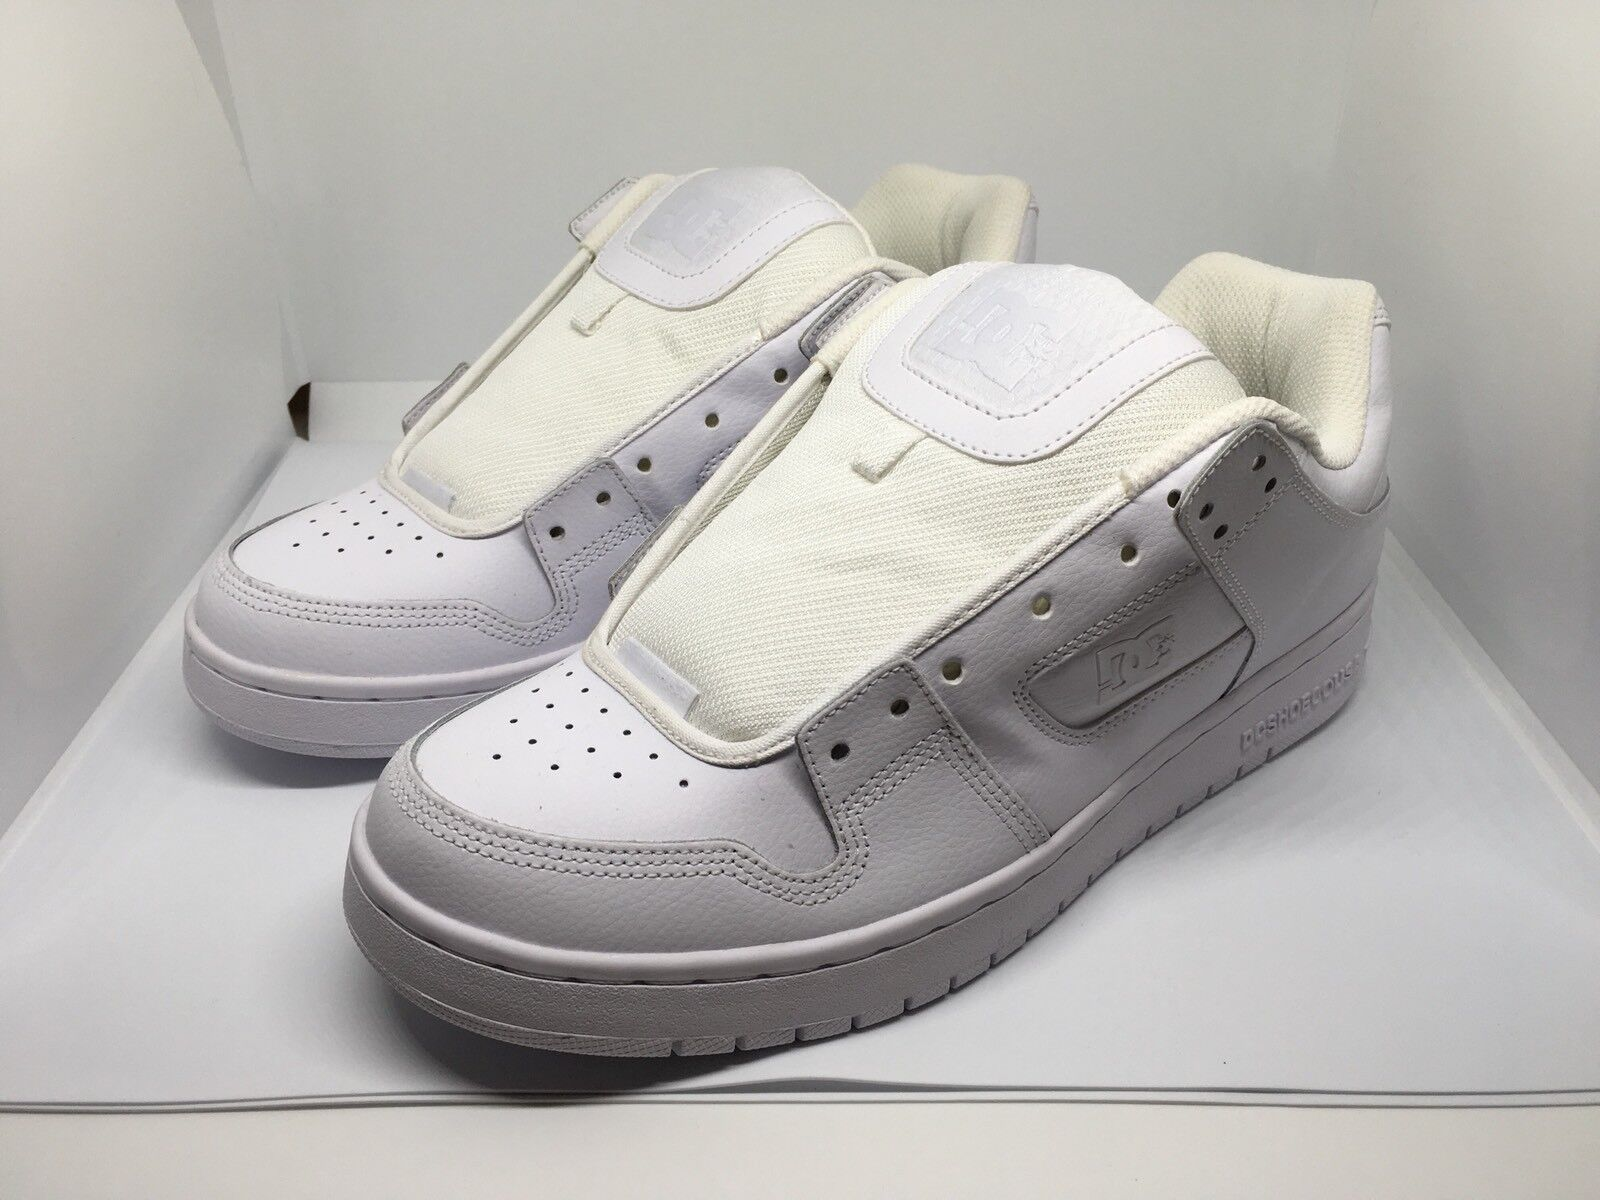 DC shoes Manteca White Ice White US 10 BNIB Brand New